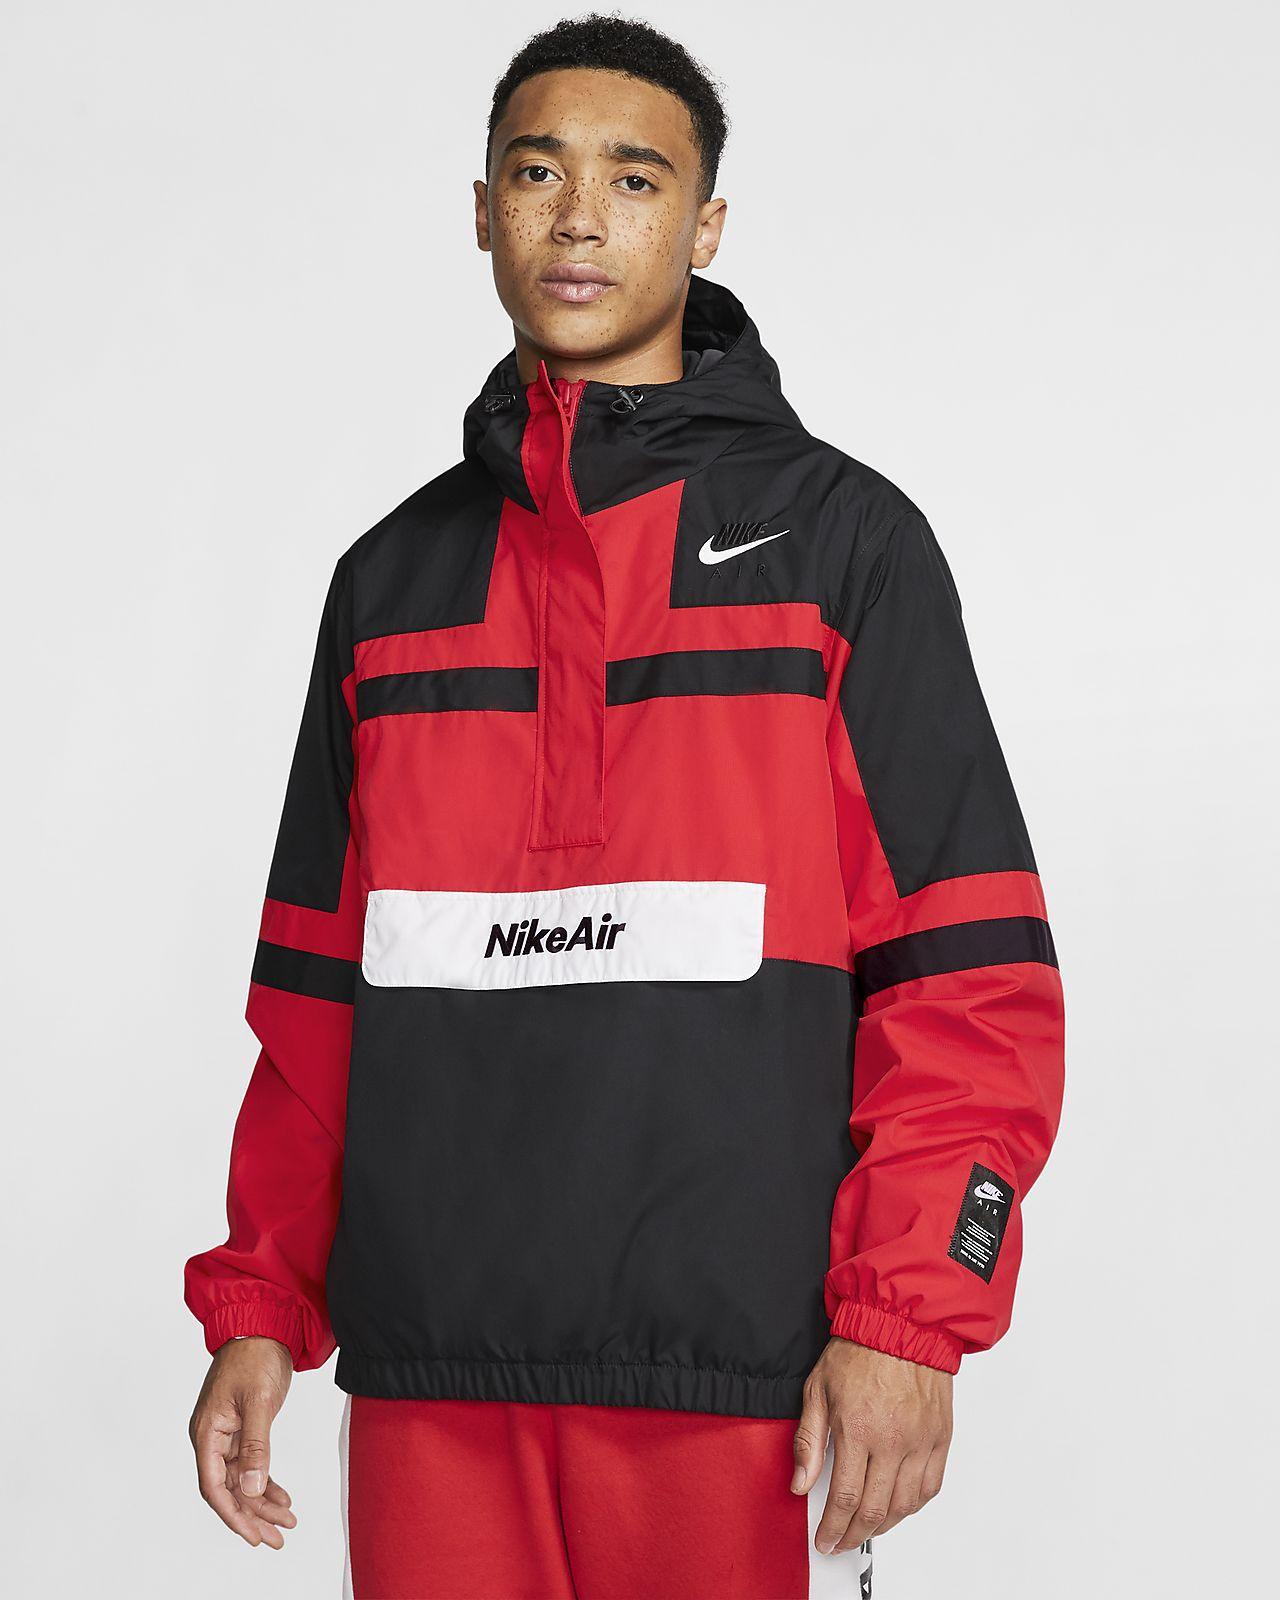 Nike Air Men's Woven Jacket